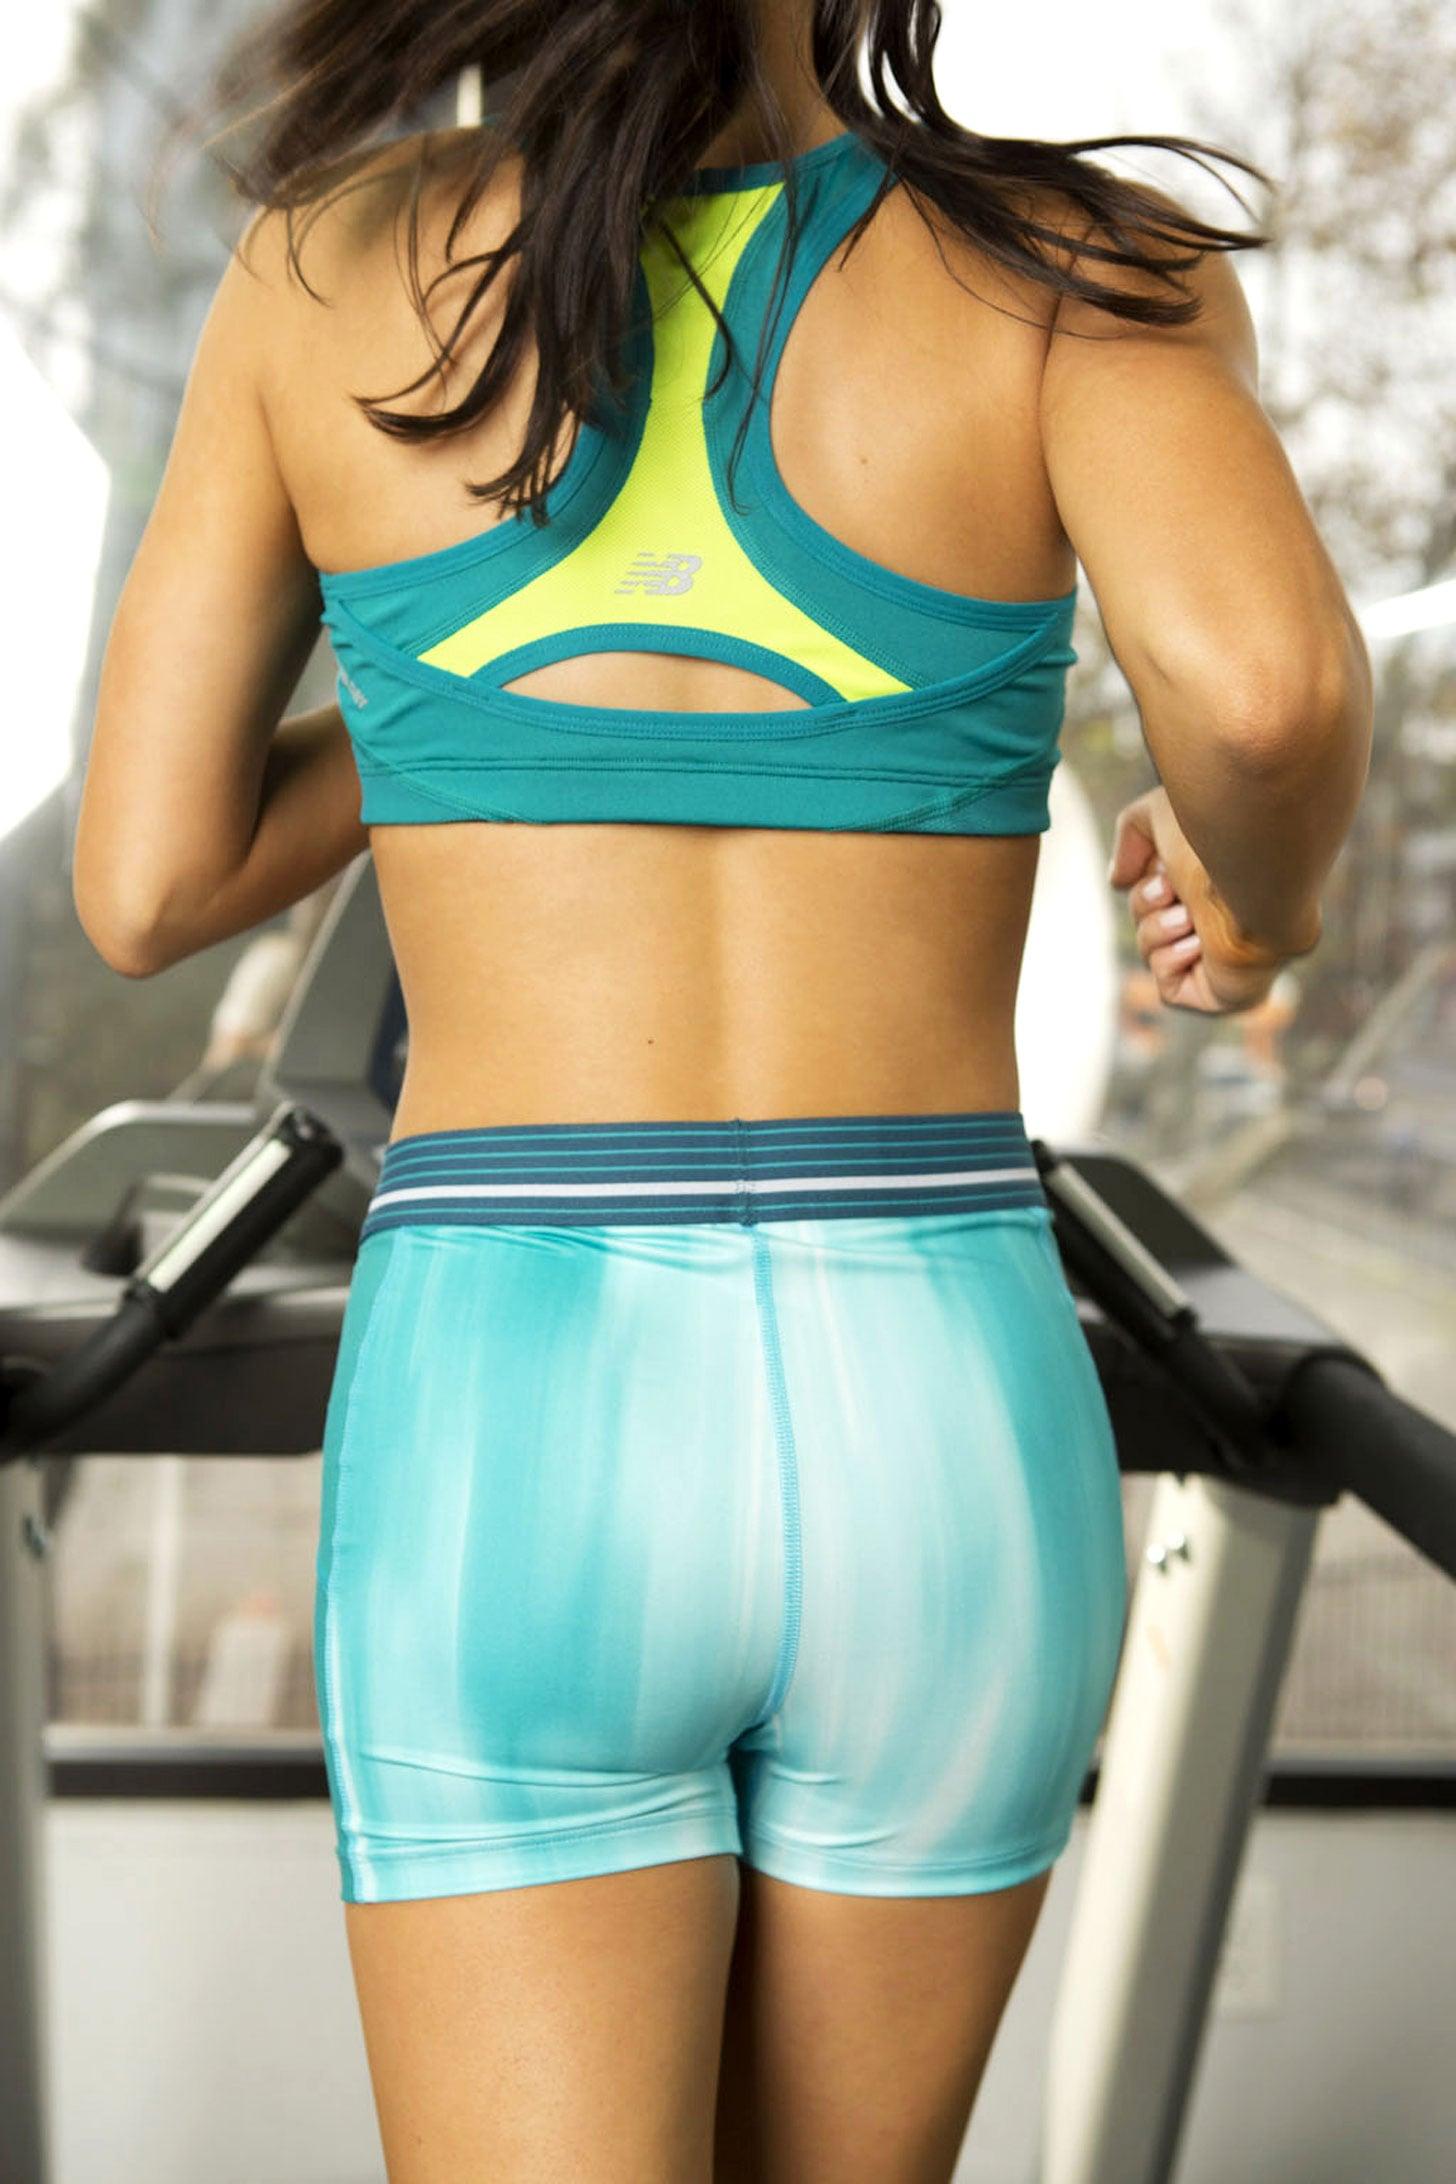 Treadmill Speed Workout | POPSUGAR Fitness